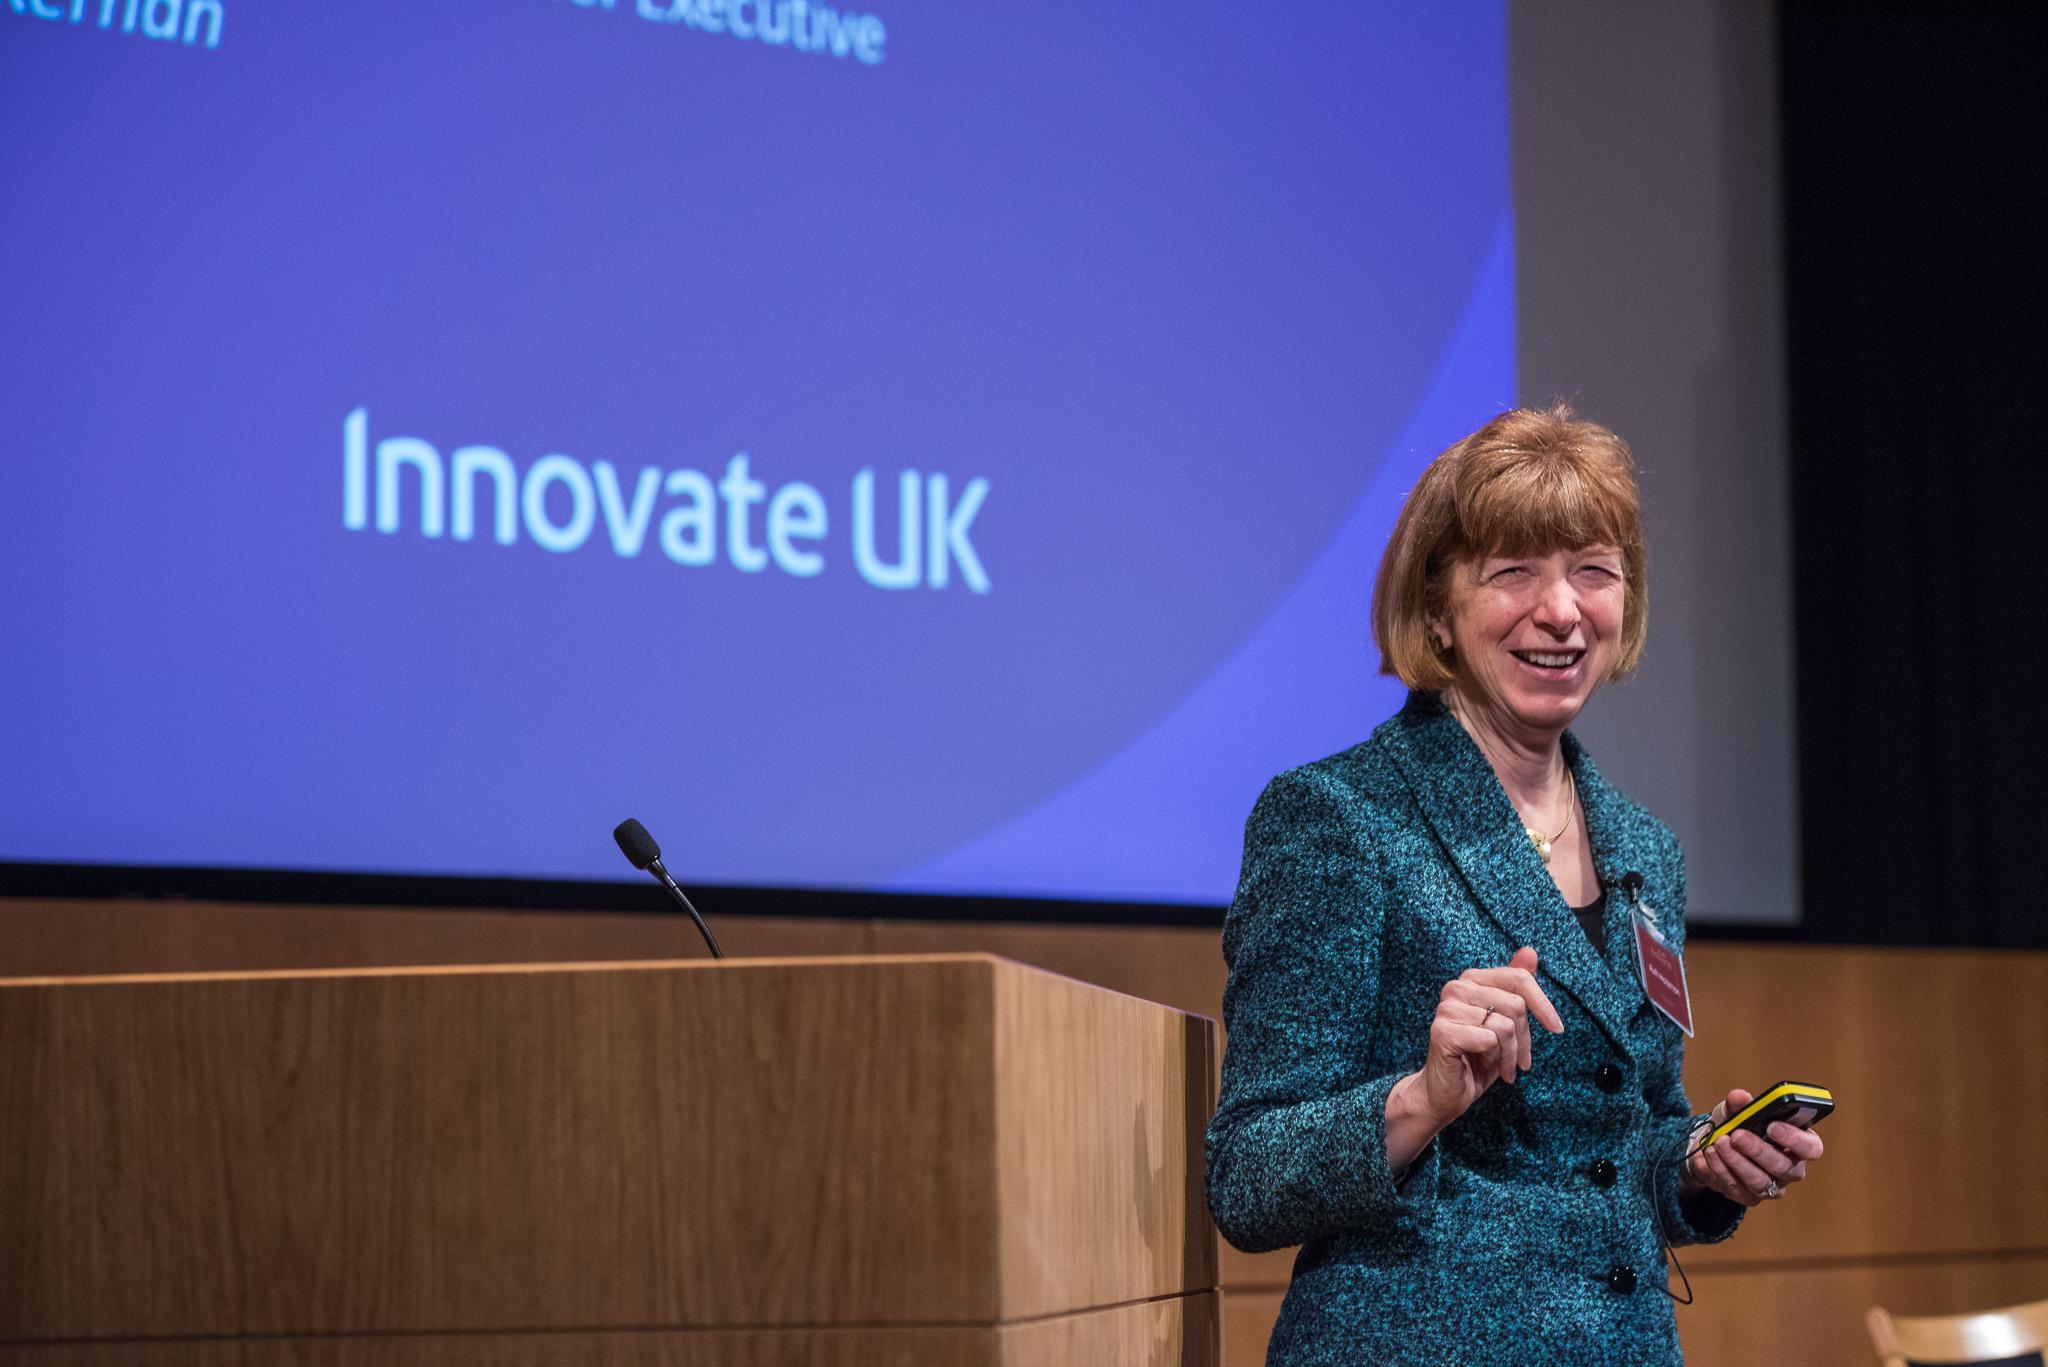 BioBeat15: Ruth McKernan, CEO of Innovate UK